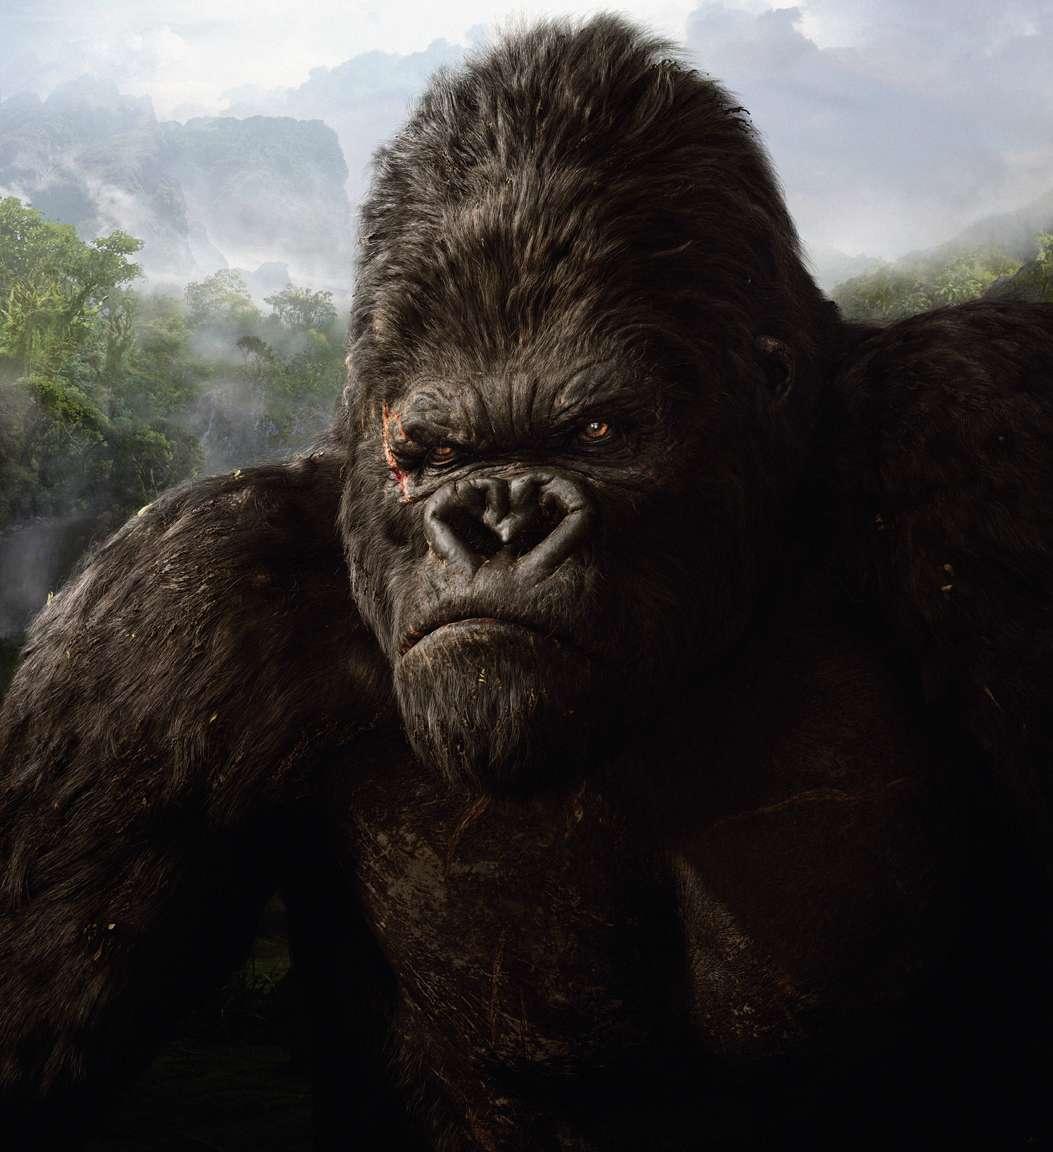 Seven Best Primate Movies